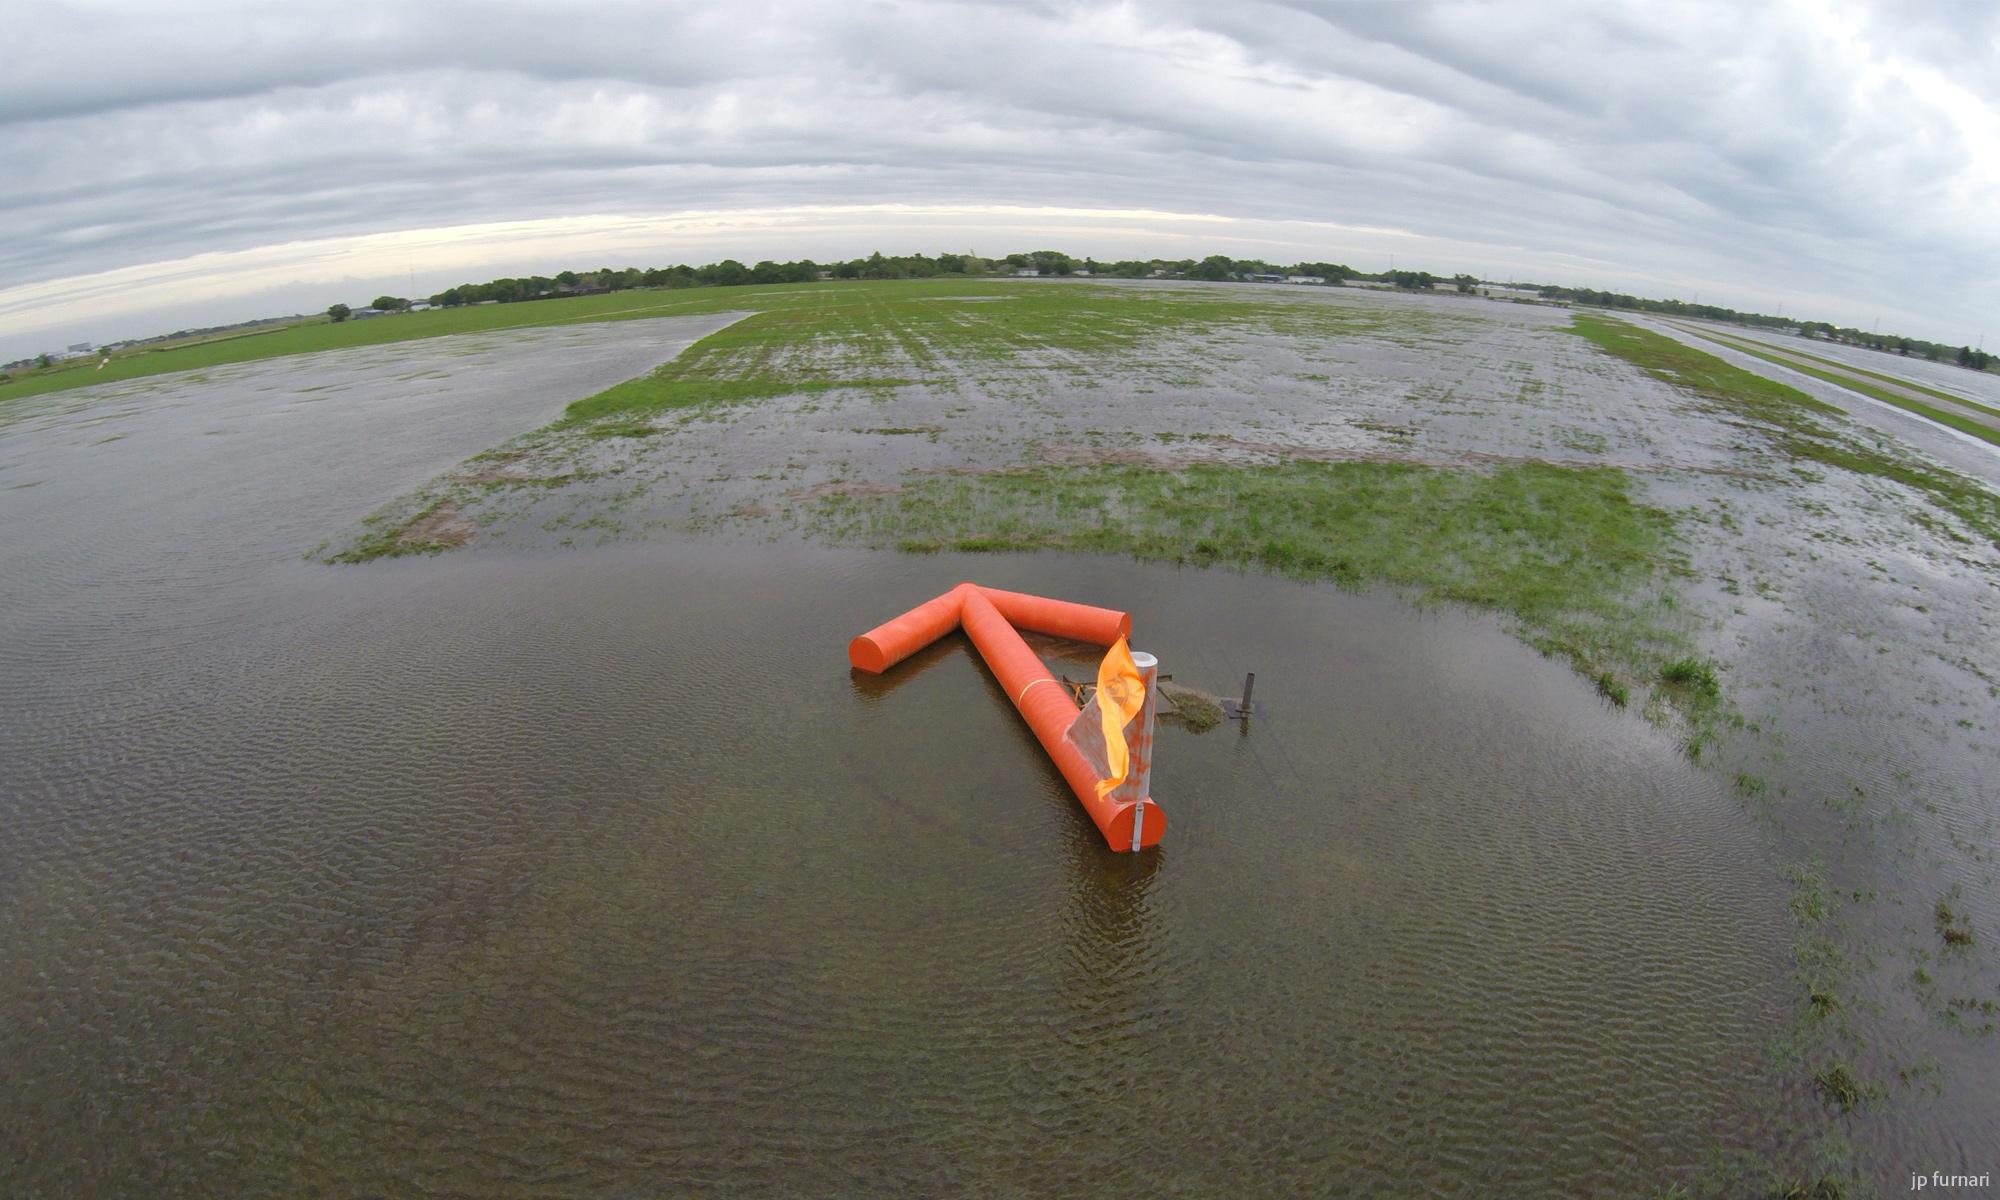 Wet landing area, by JP Furnari